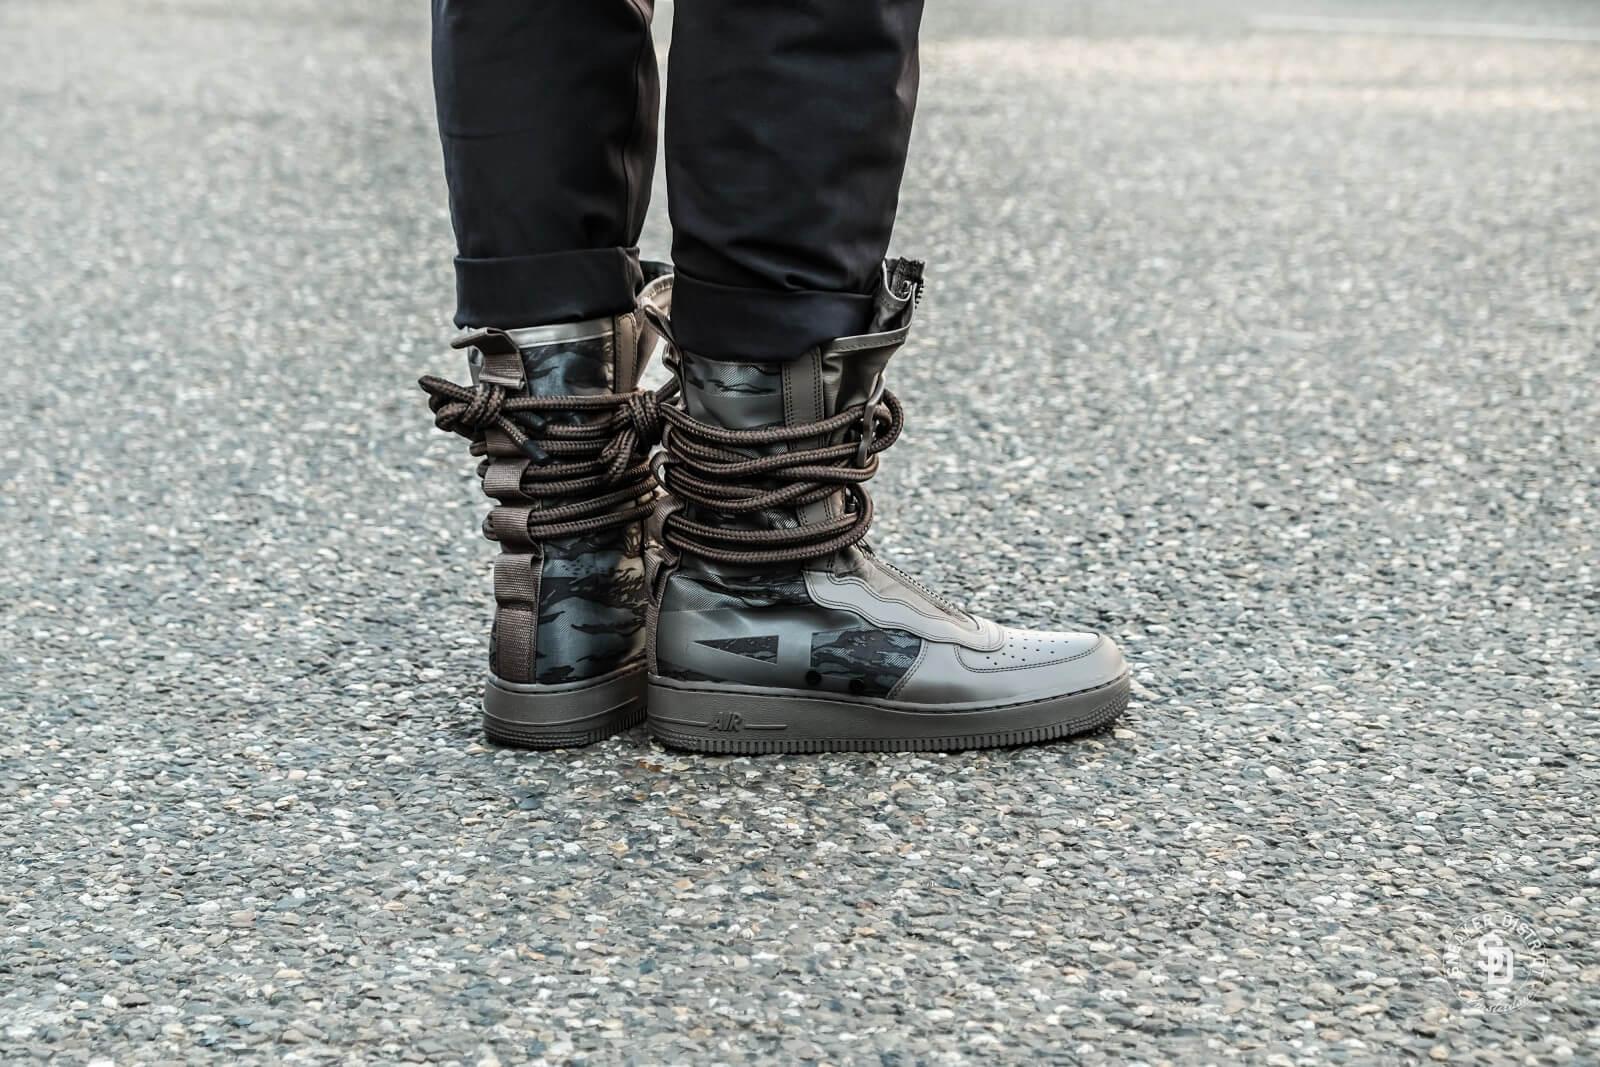 Details about Nike SF Air Force 1 High Boots Ridgerock Black